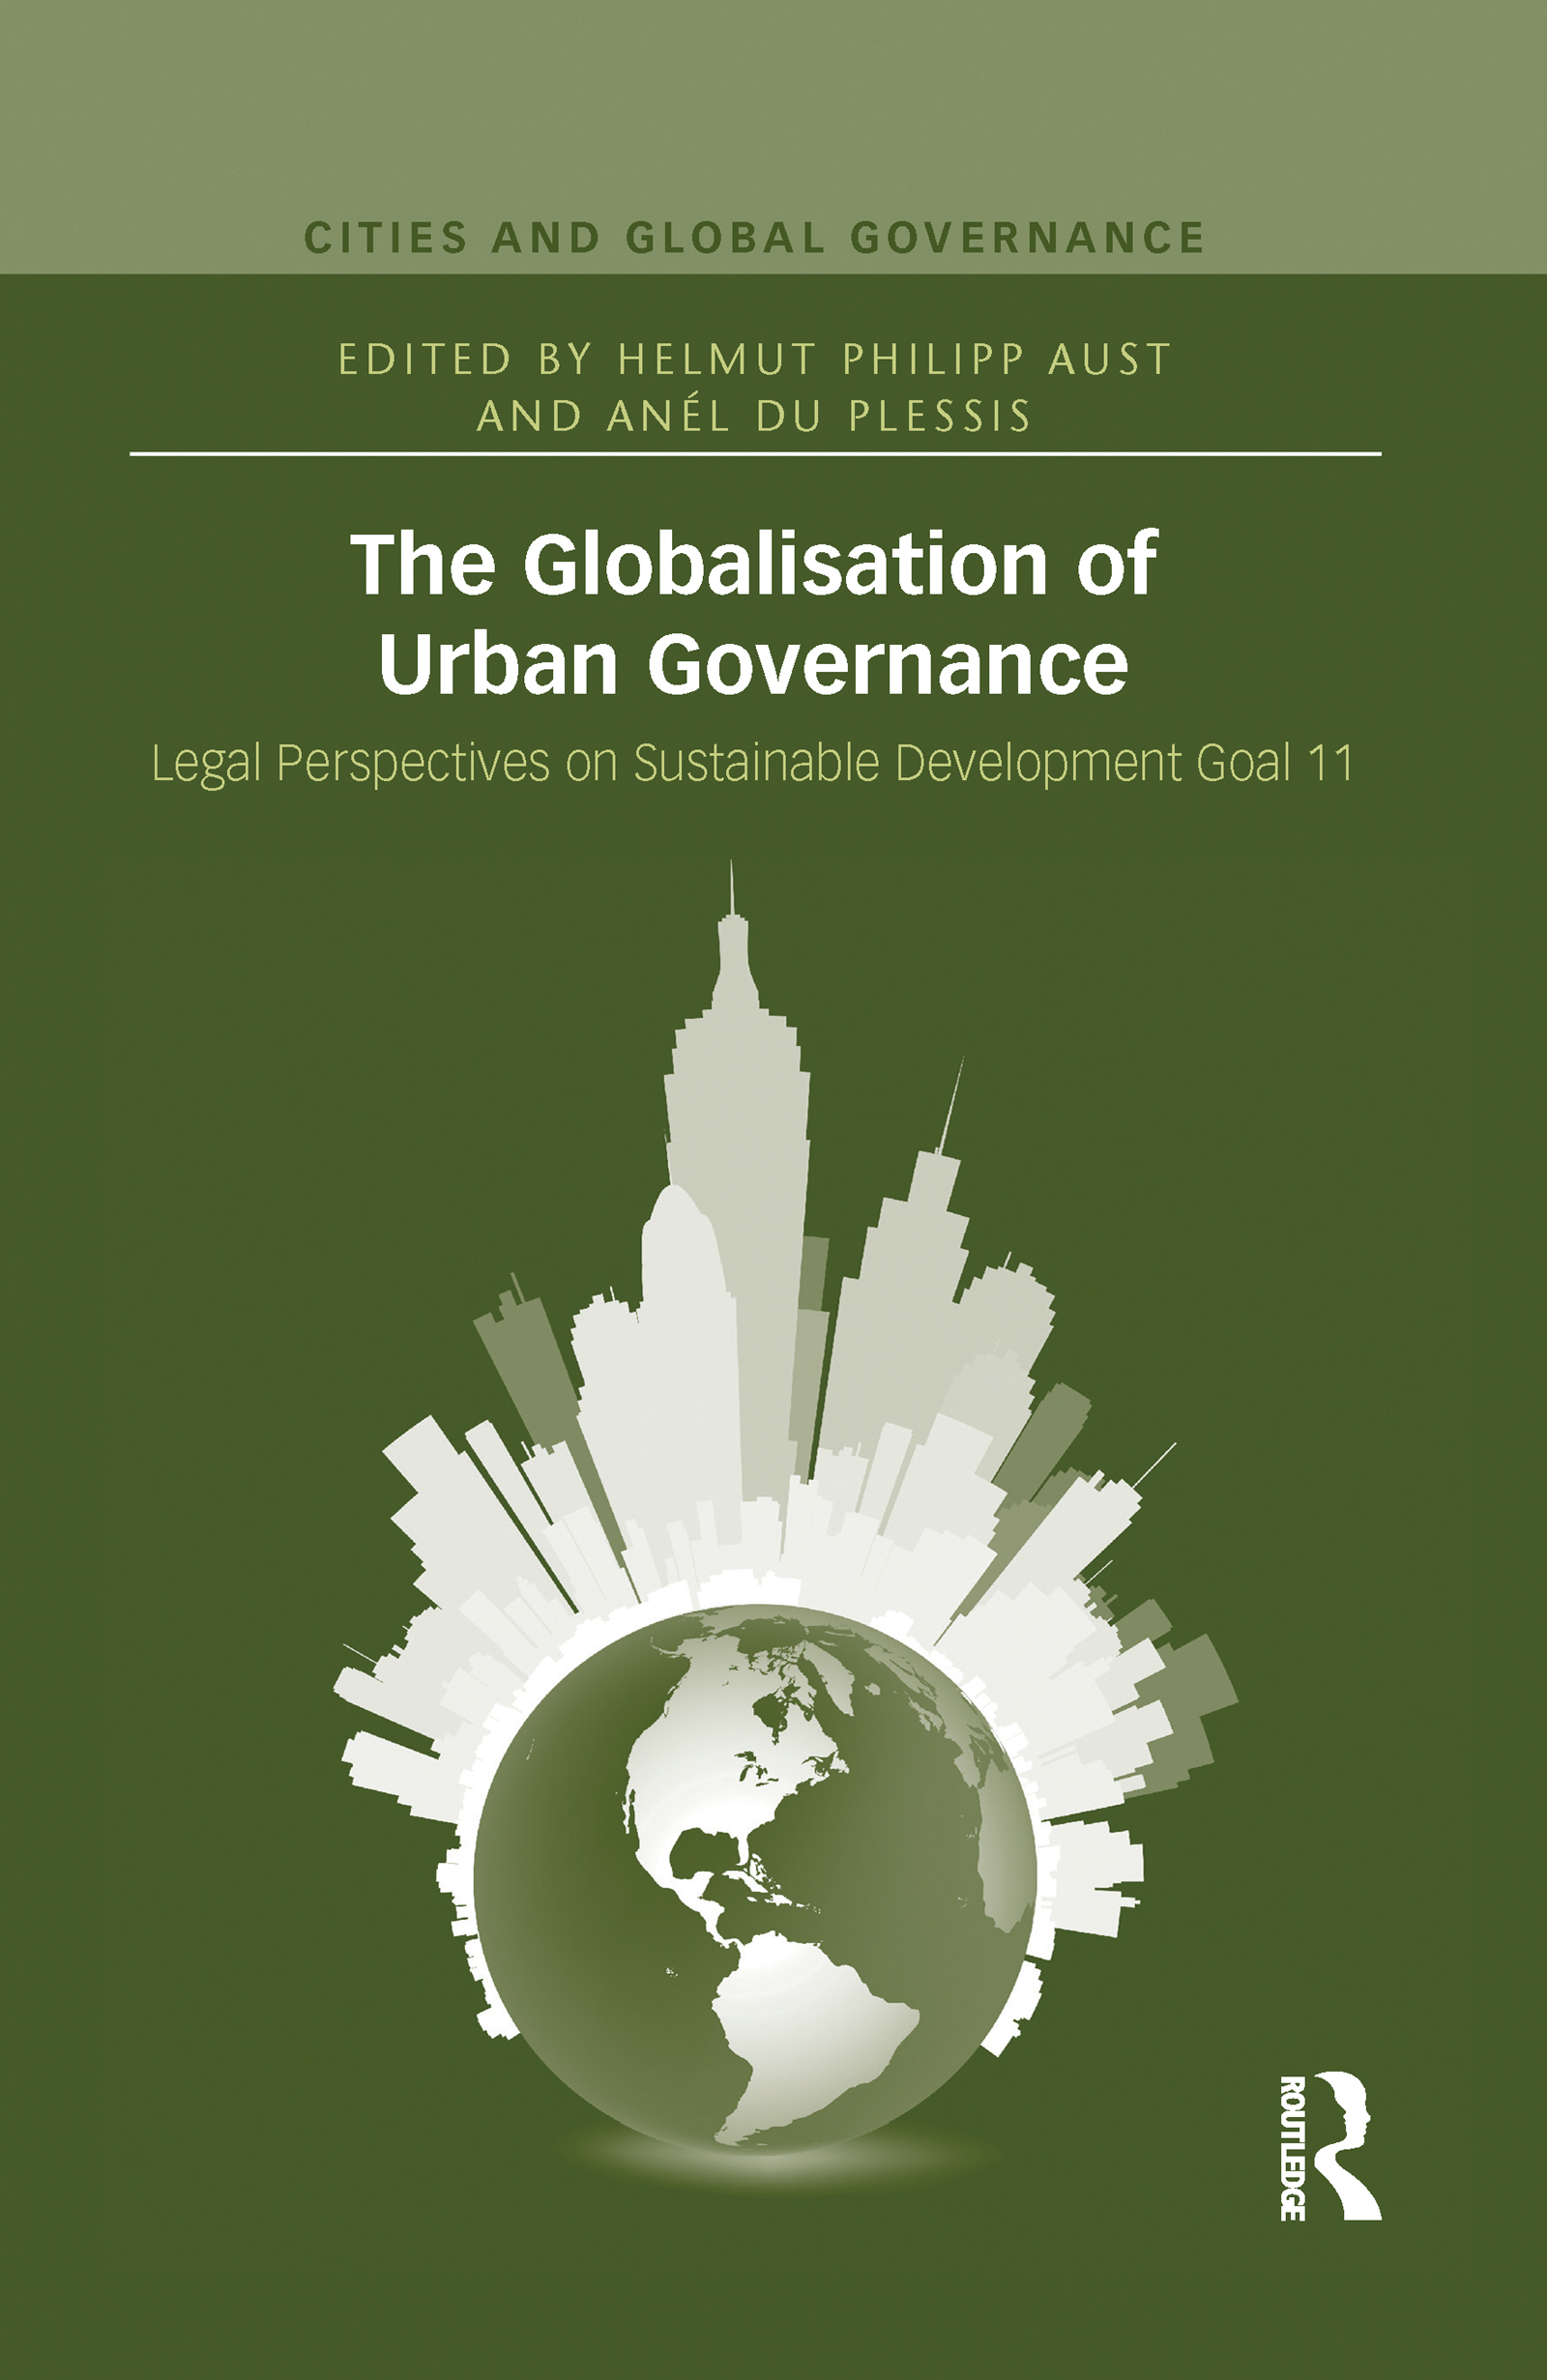 The Globalisation of Urban Governance